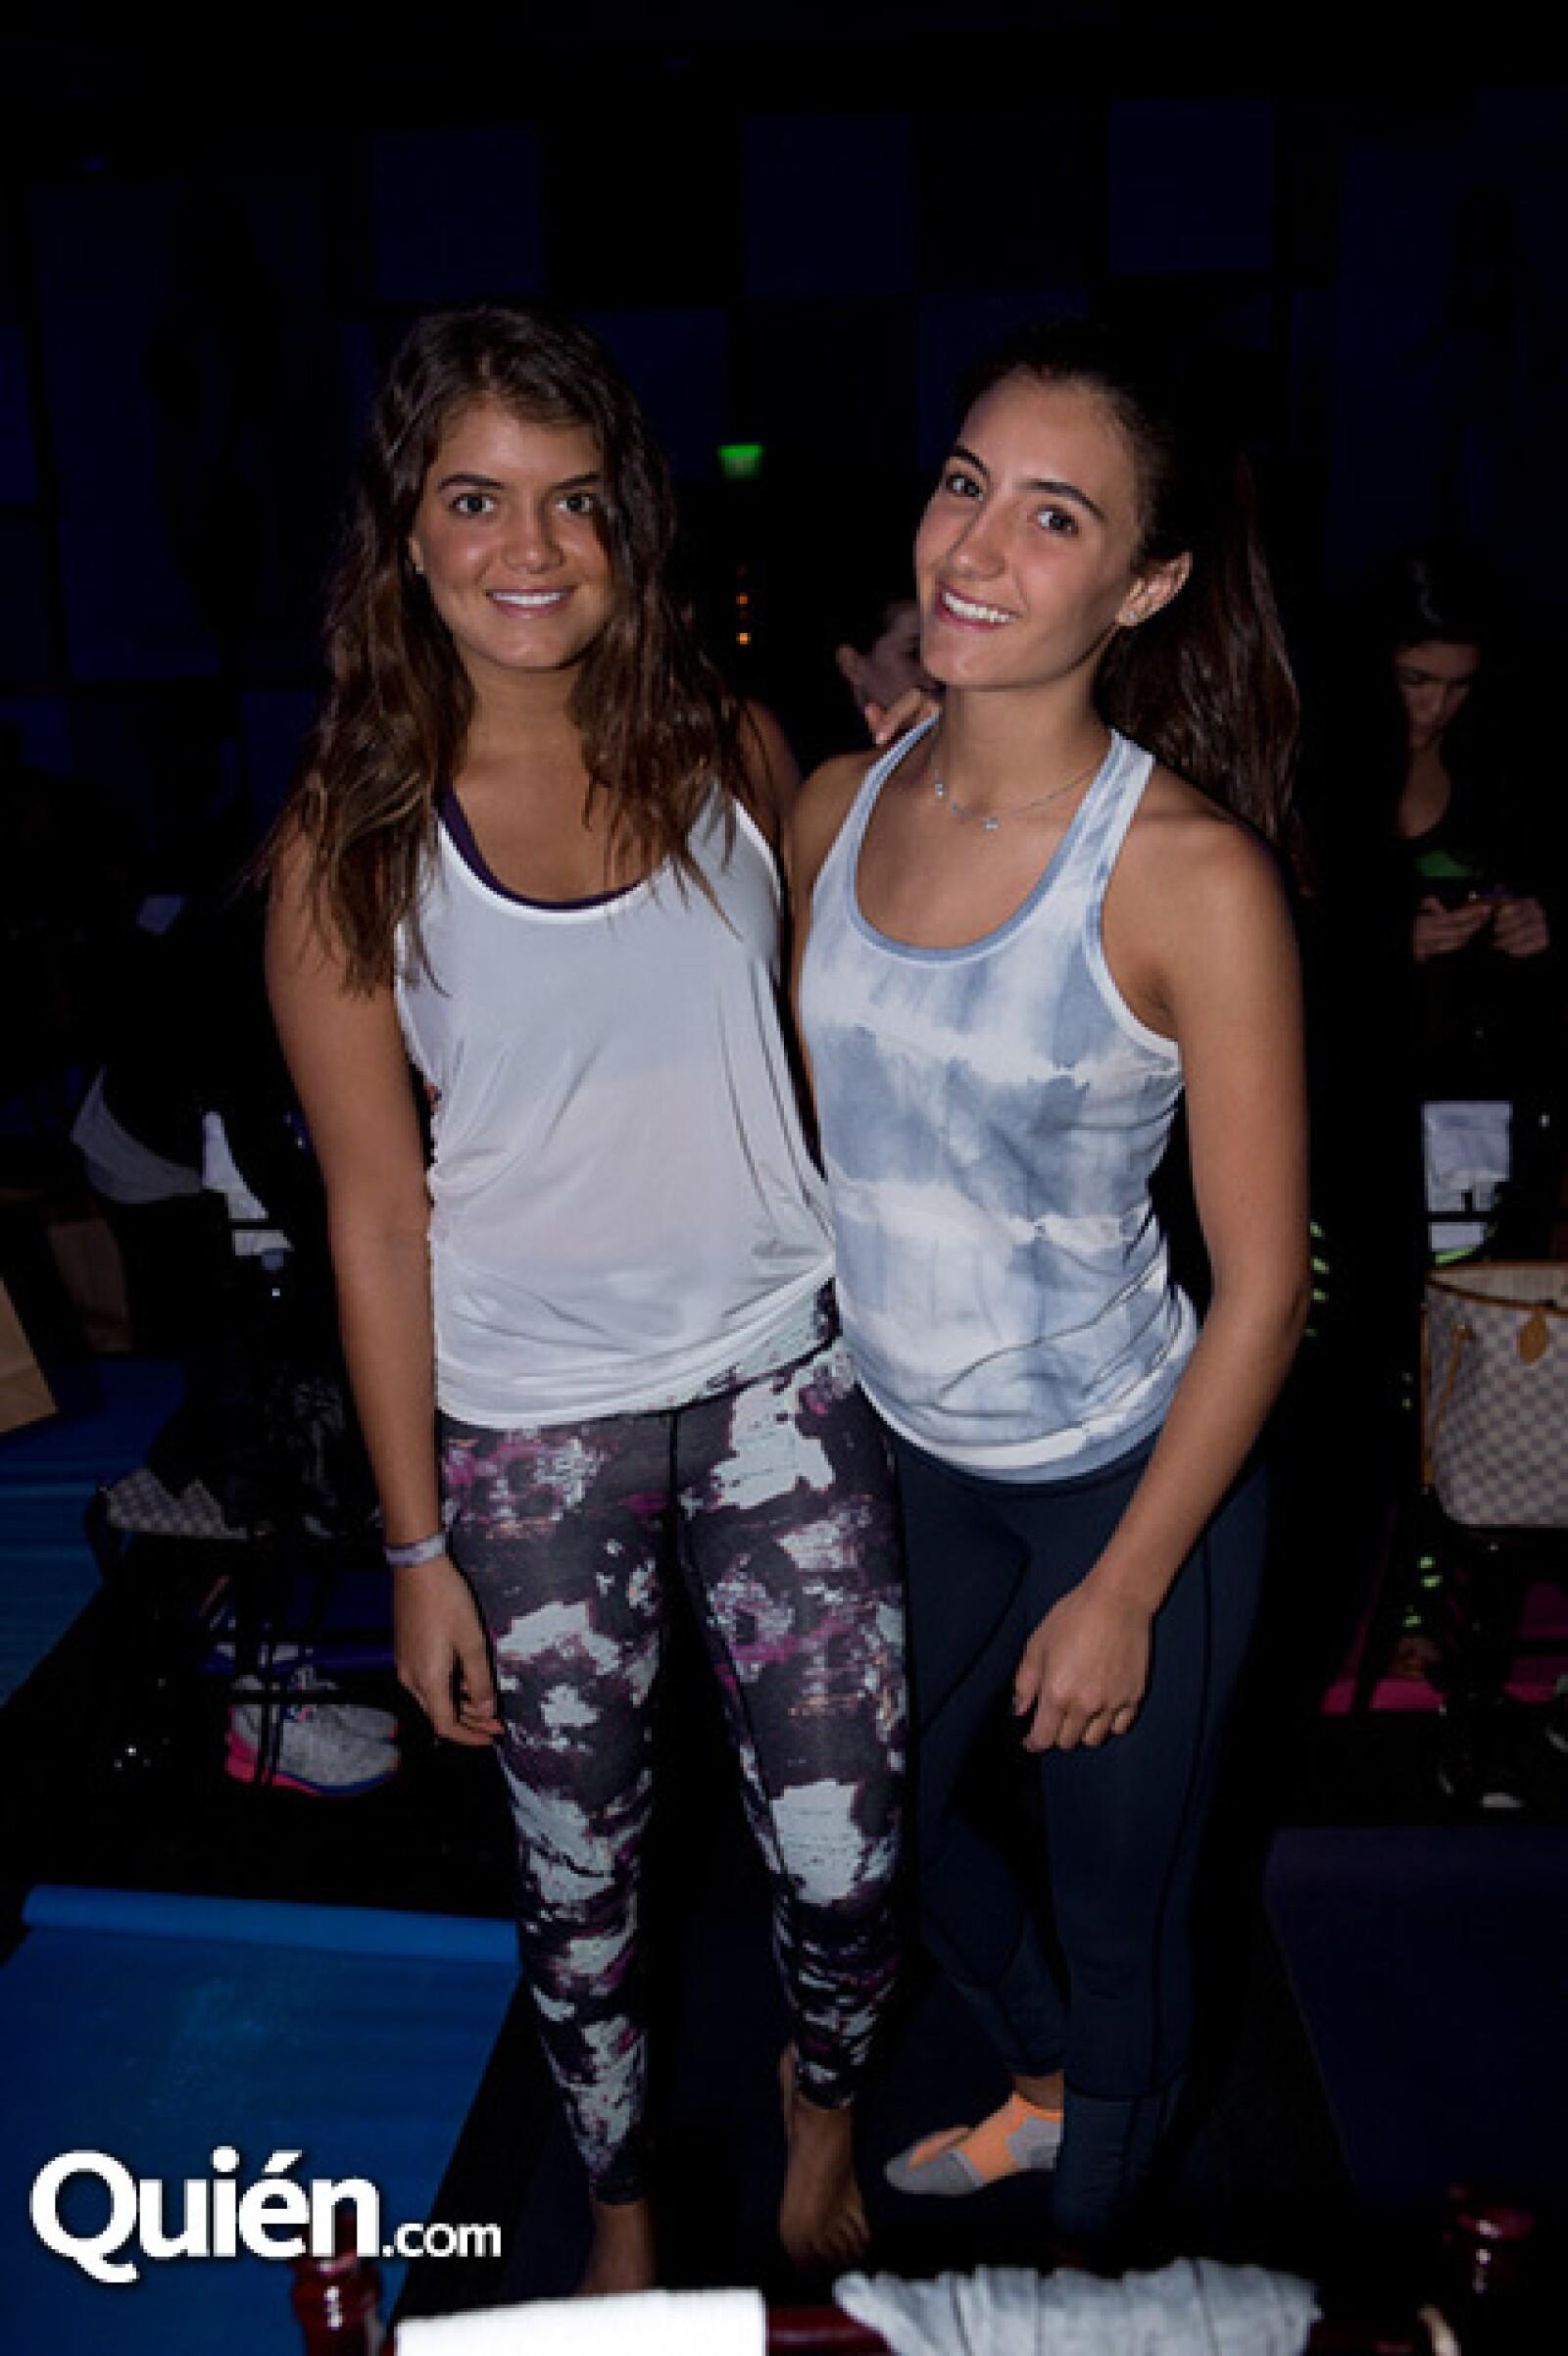 Camila Kanahuati y Daniela Kanahuati